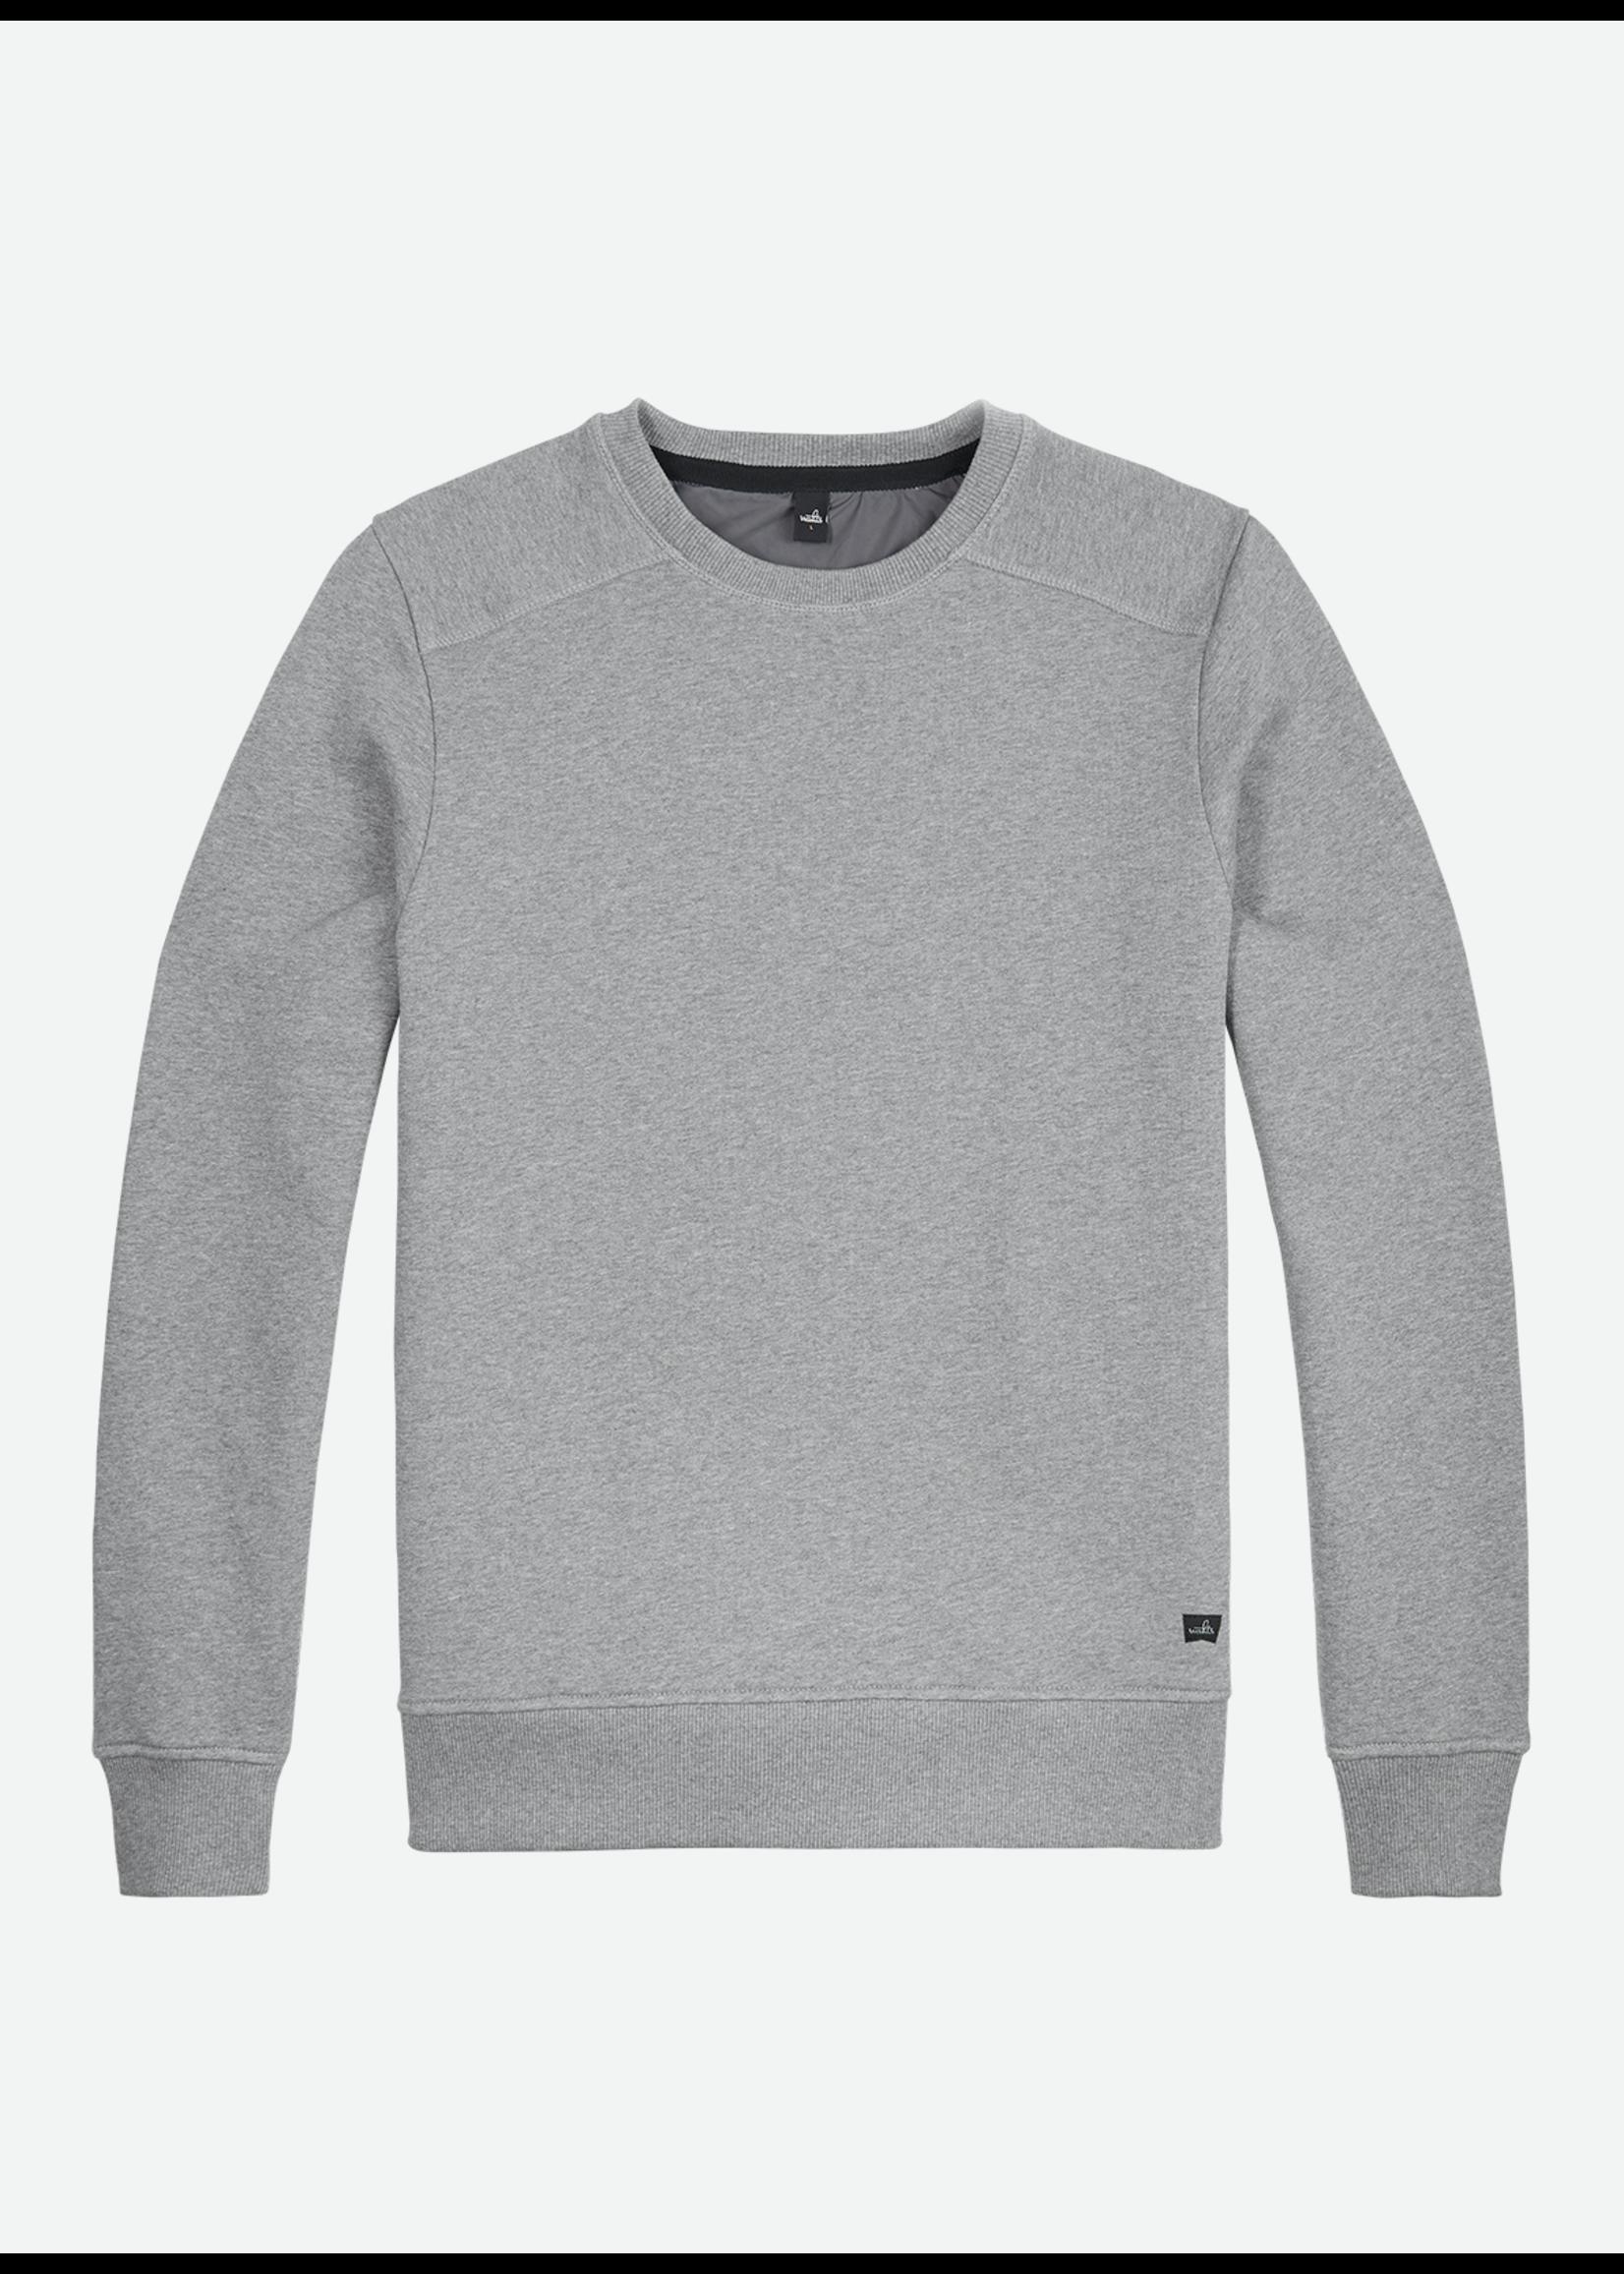 Wahts Moore plain mid grey